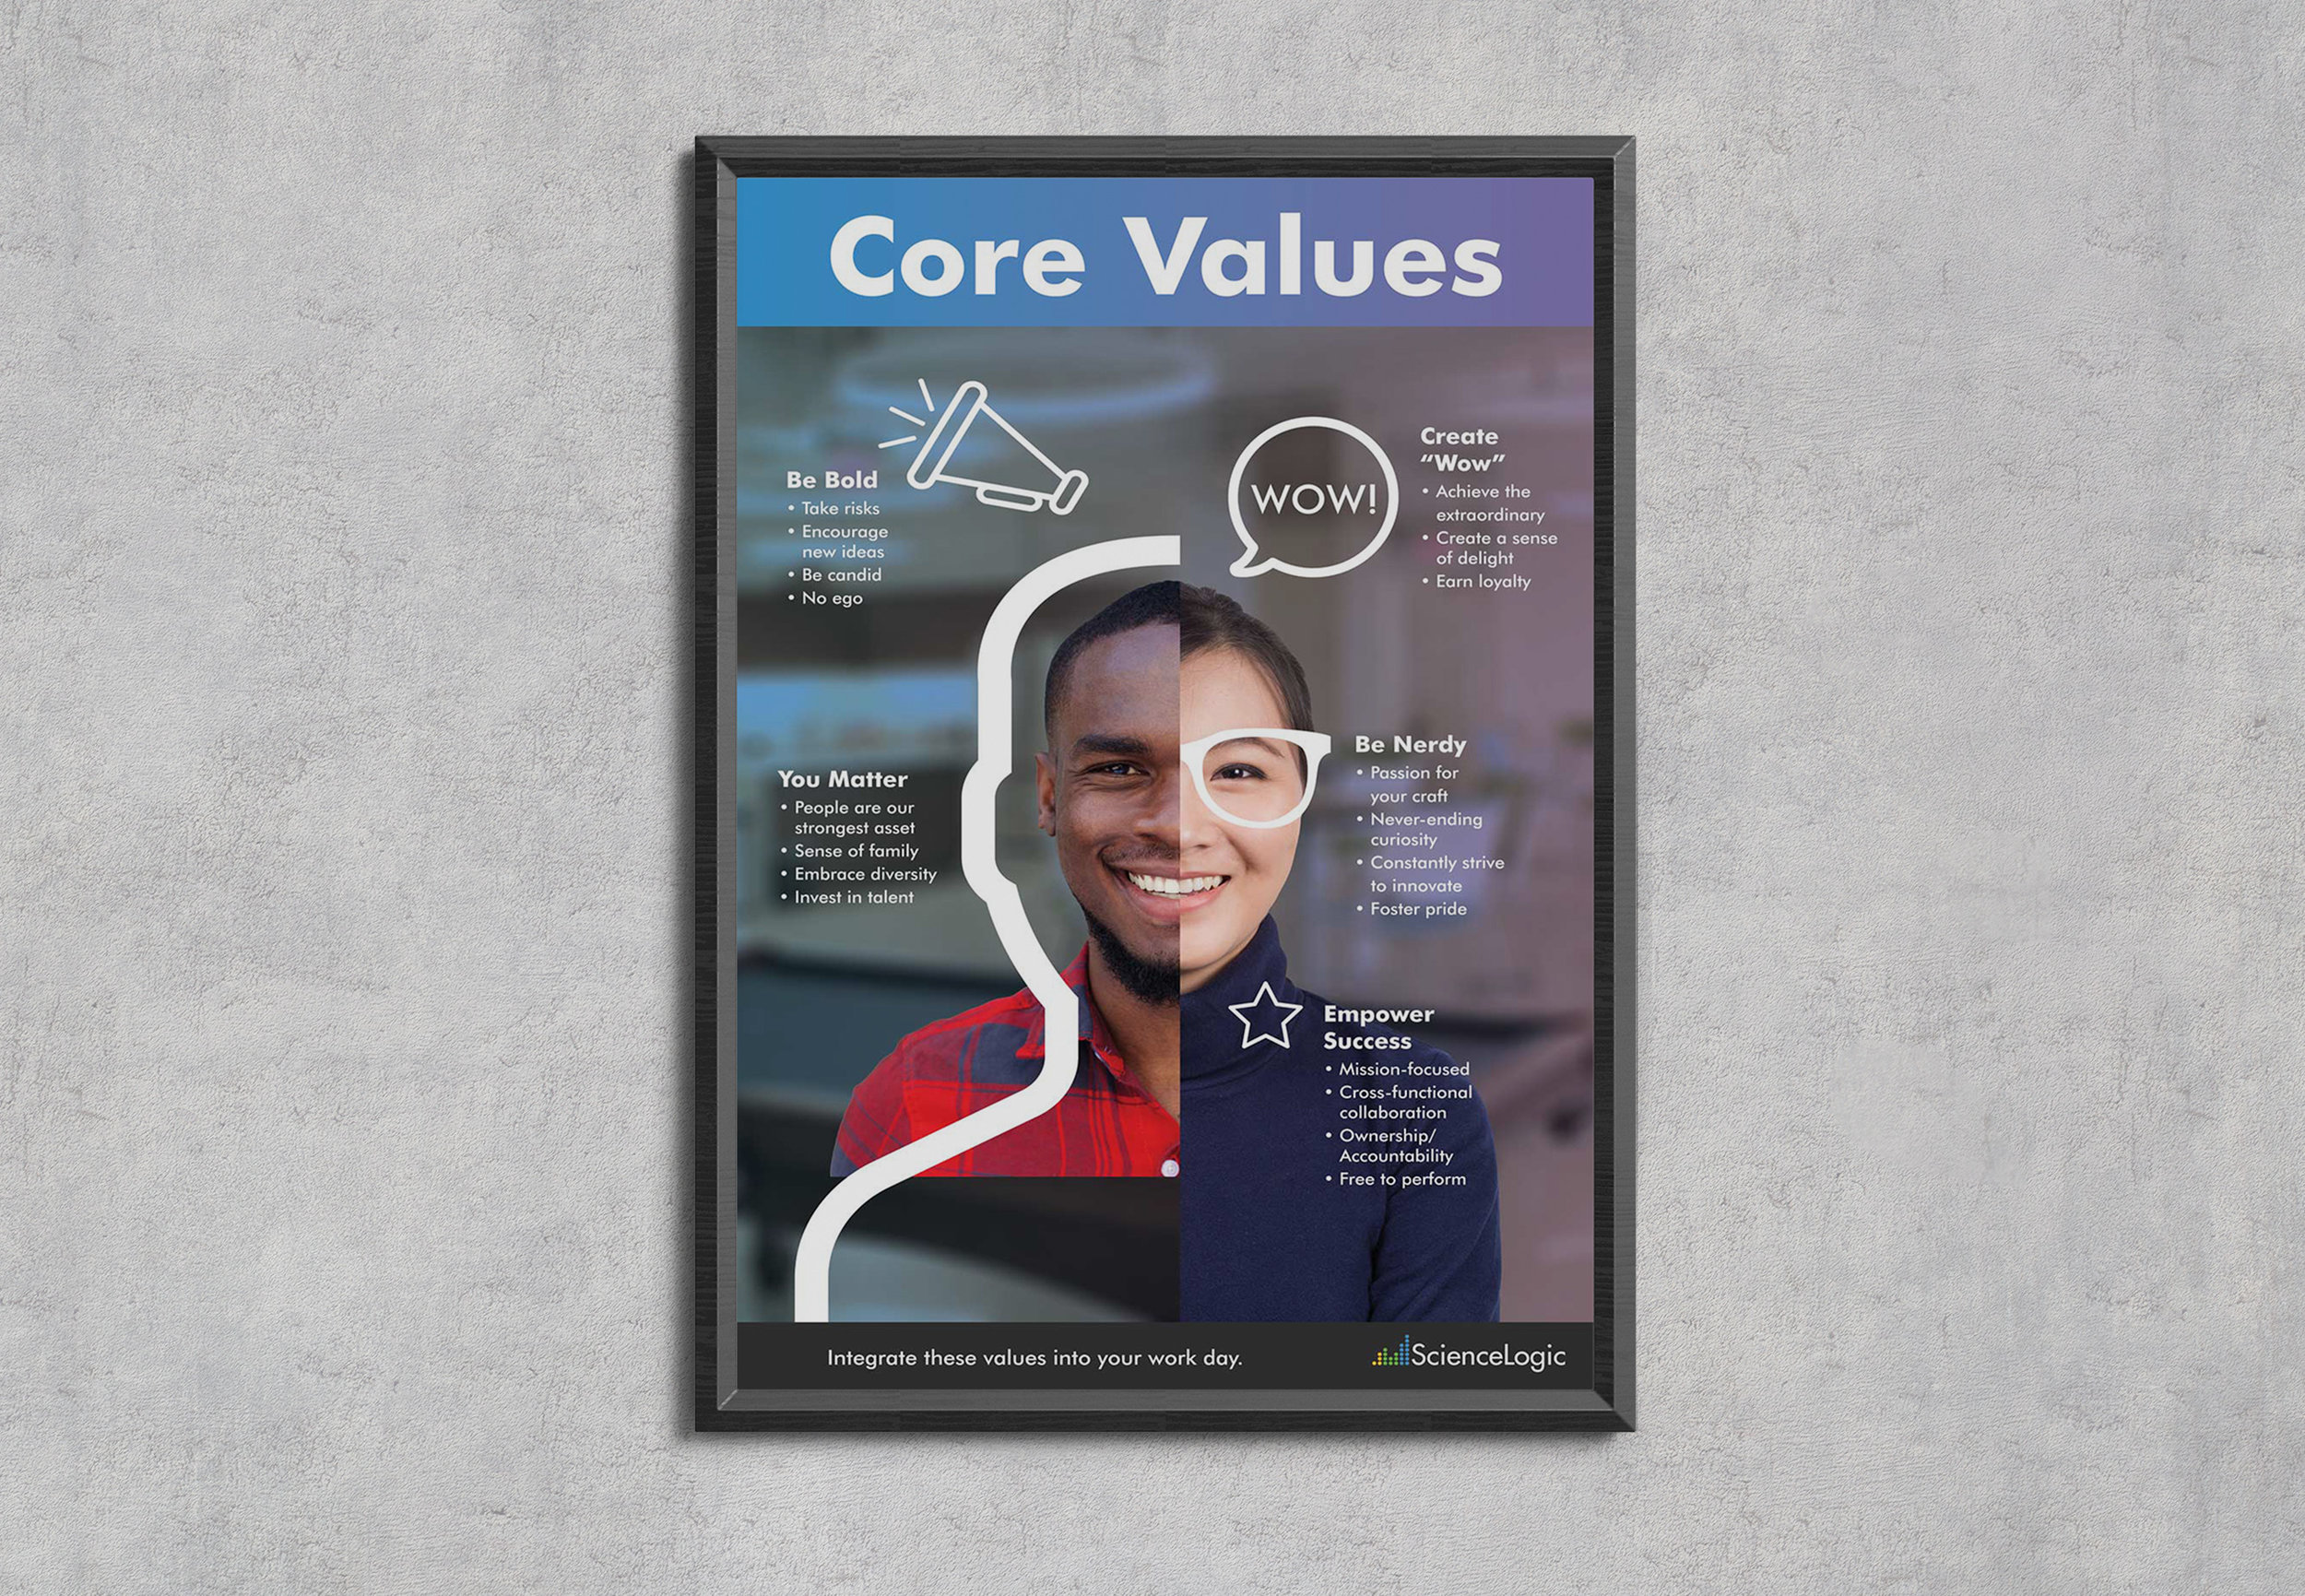 ScienceLogic Corporate Core Values Poster